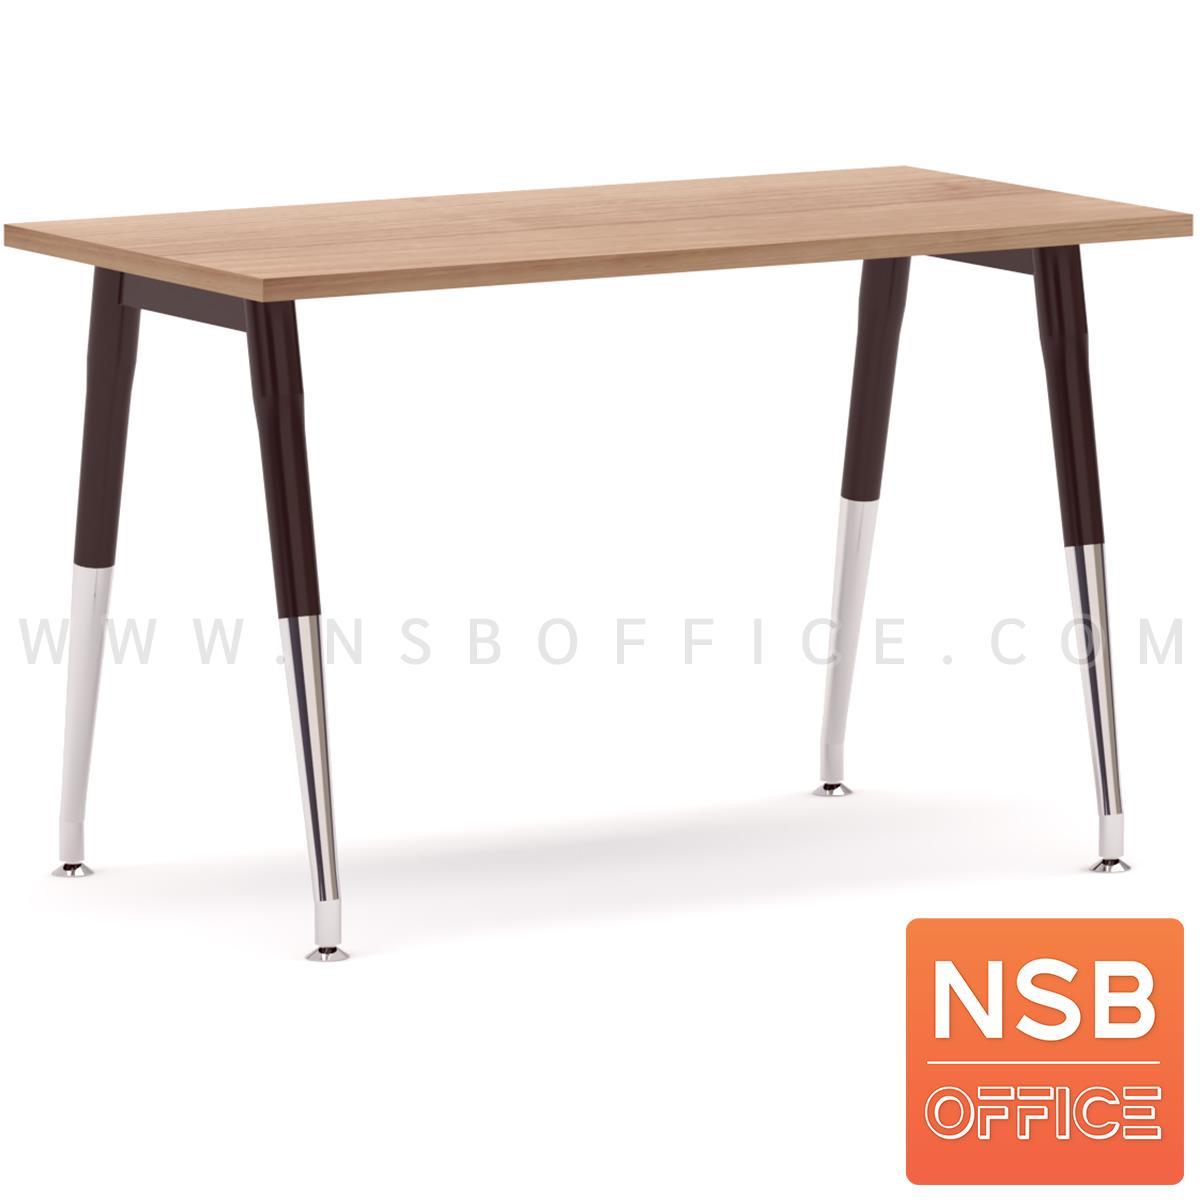 A18A039:โต๊ะทำงานโล่ง รุ่น MODERN-13  ขาเหล็กวีคว่ำ ปลายเรียว